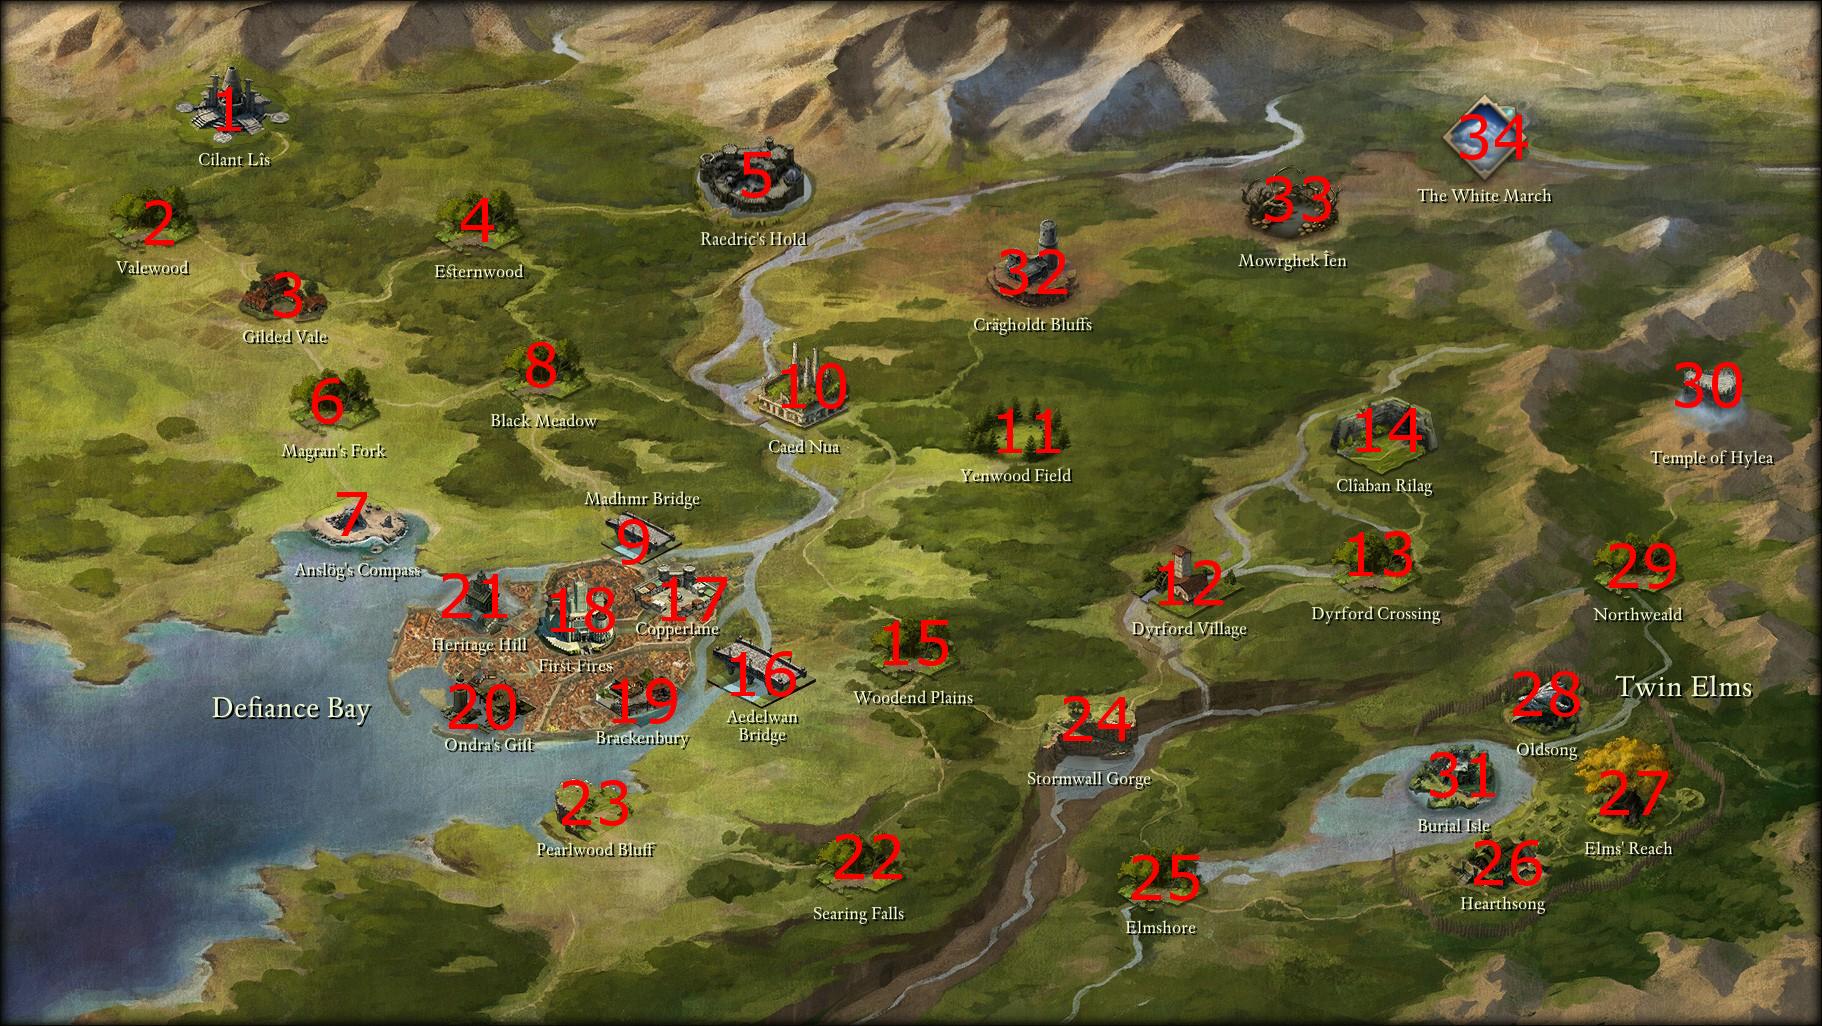 Pillars Of Eternity 2 World Map World Map   Pillars of Eternity Online Walkthrough by David